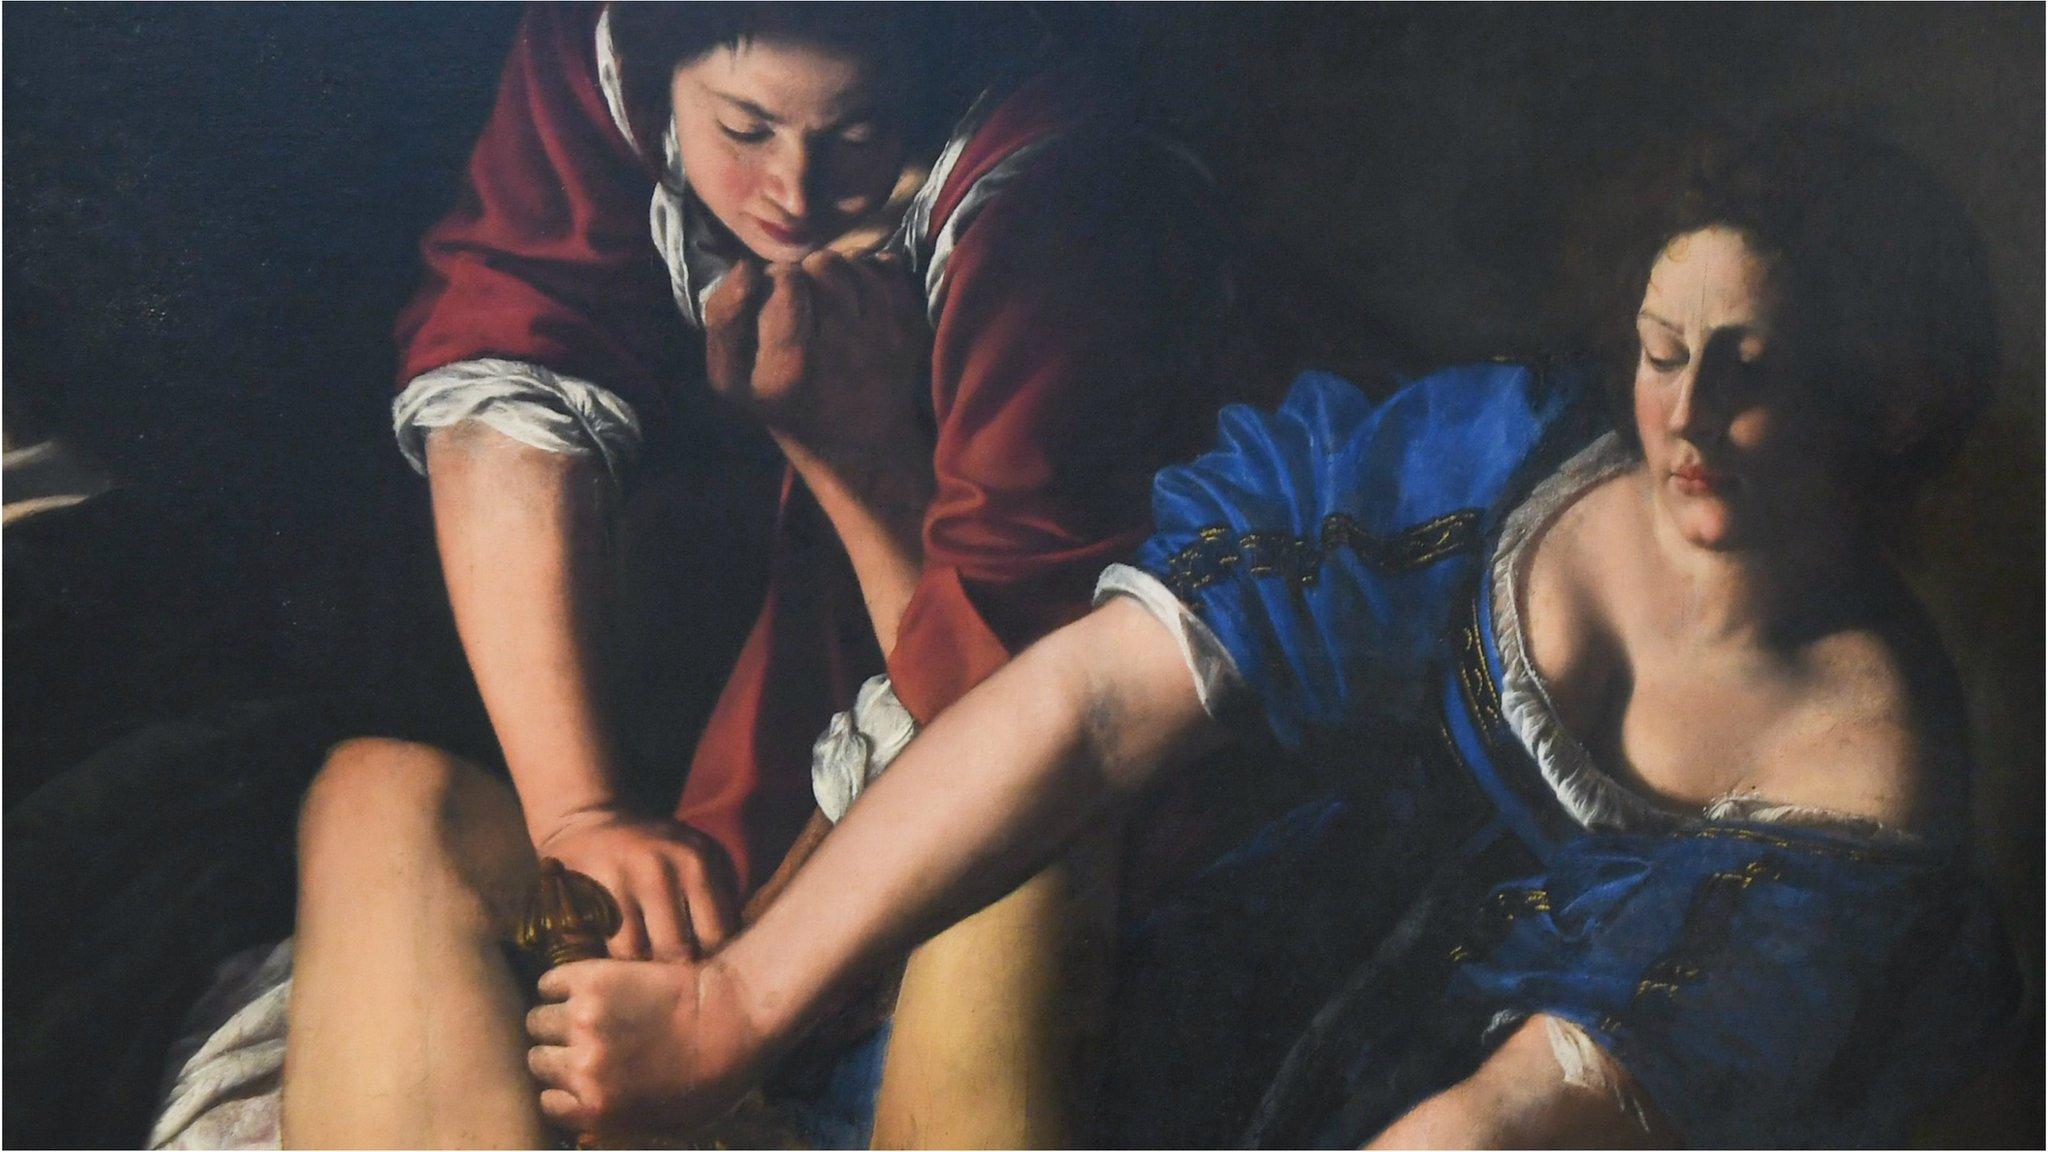 German poster of Baroque old master 'too disturbing'